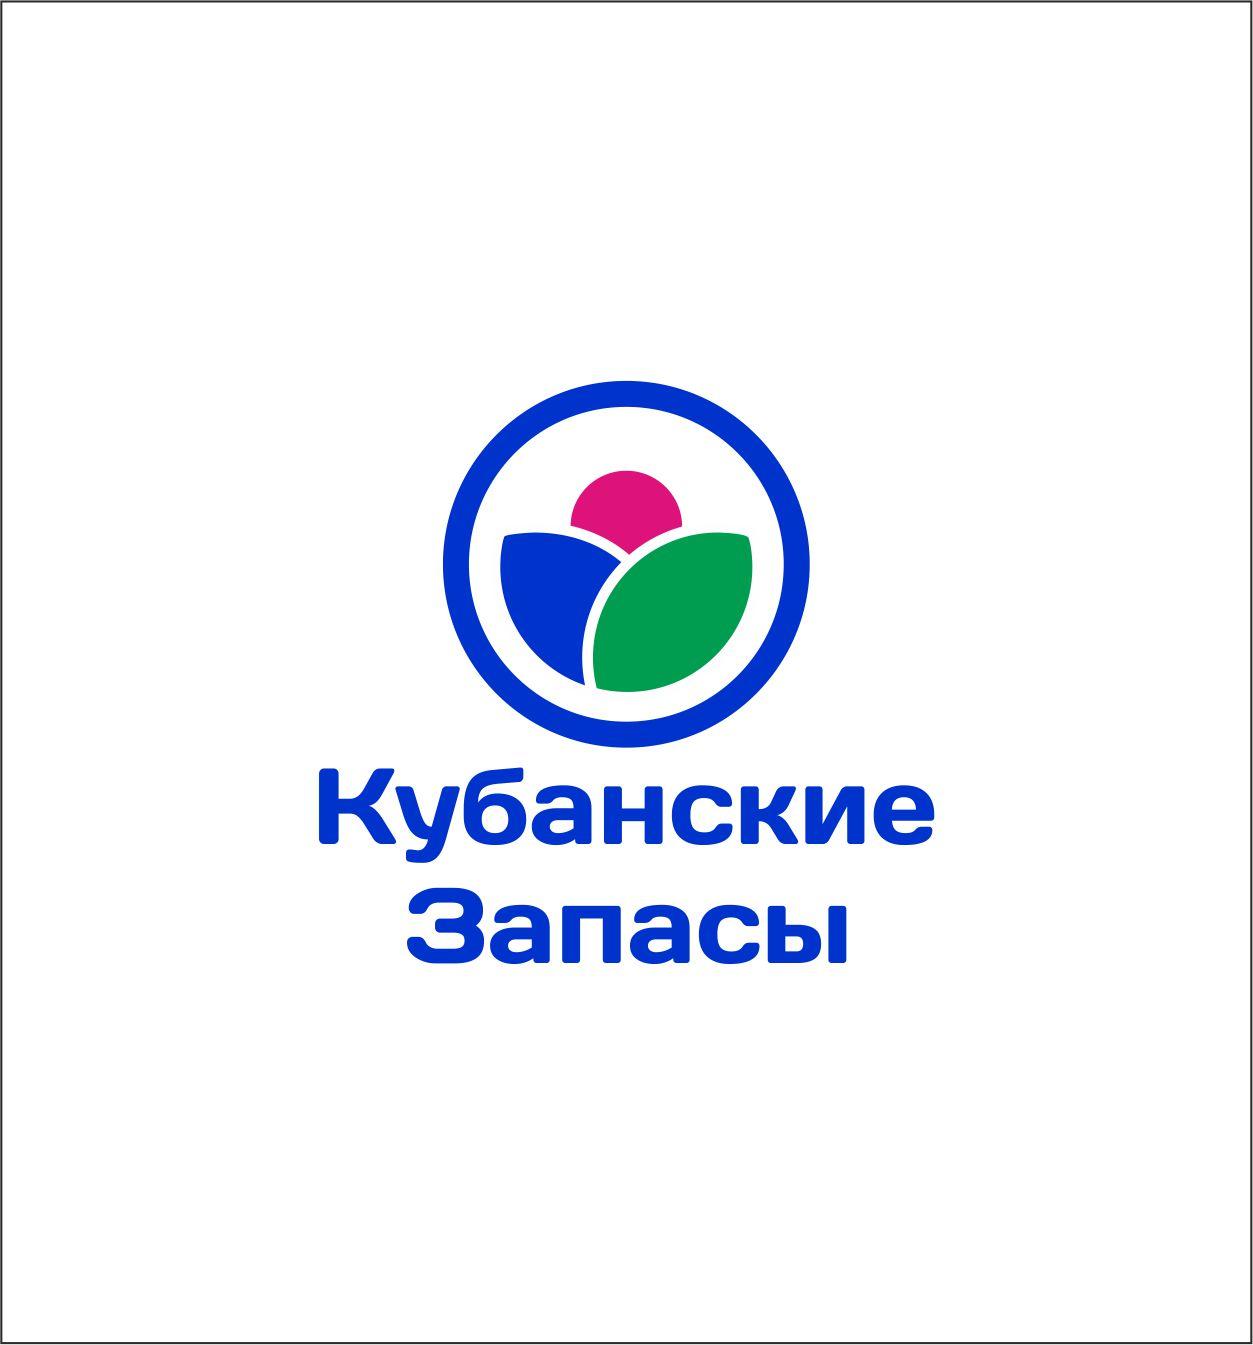 Логотип, фирменный стиль фото f_5975de6cc1e7500f.jpg